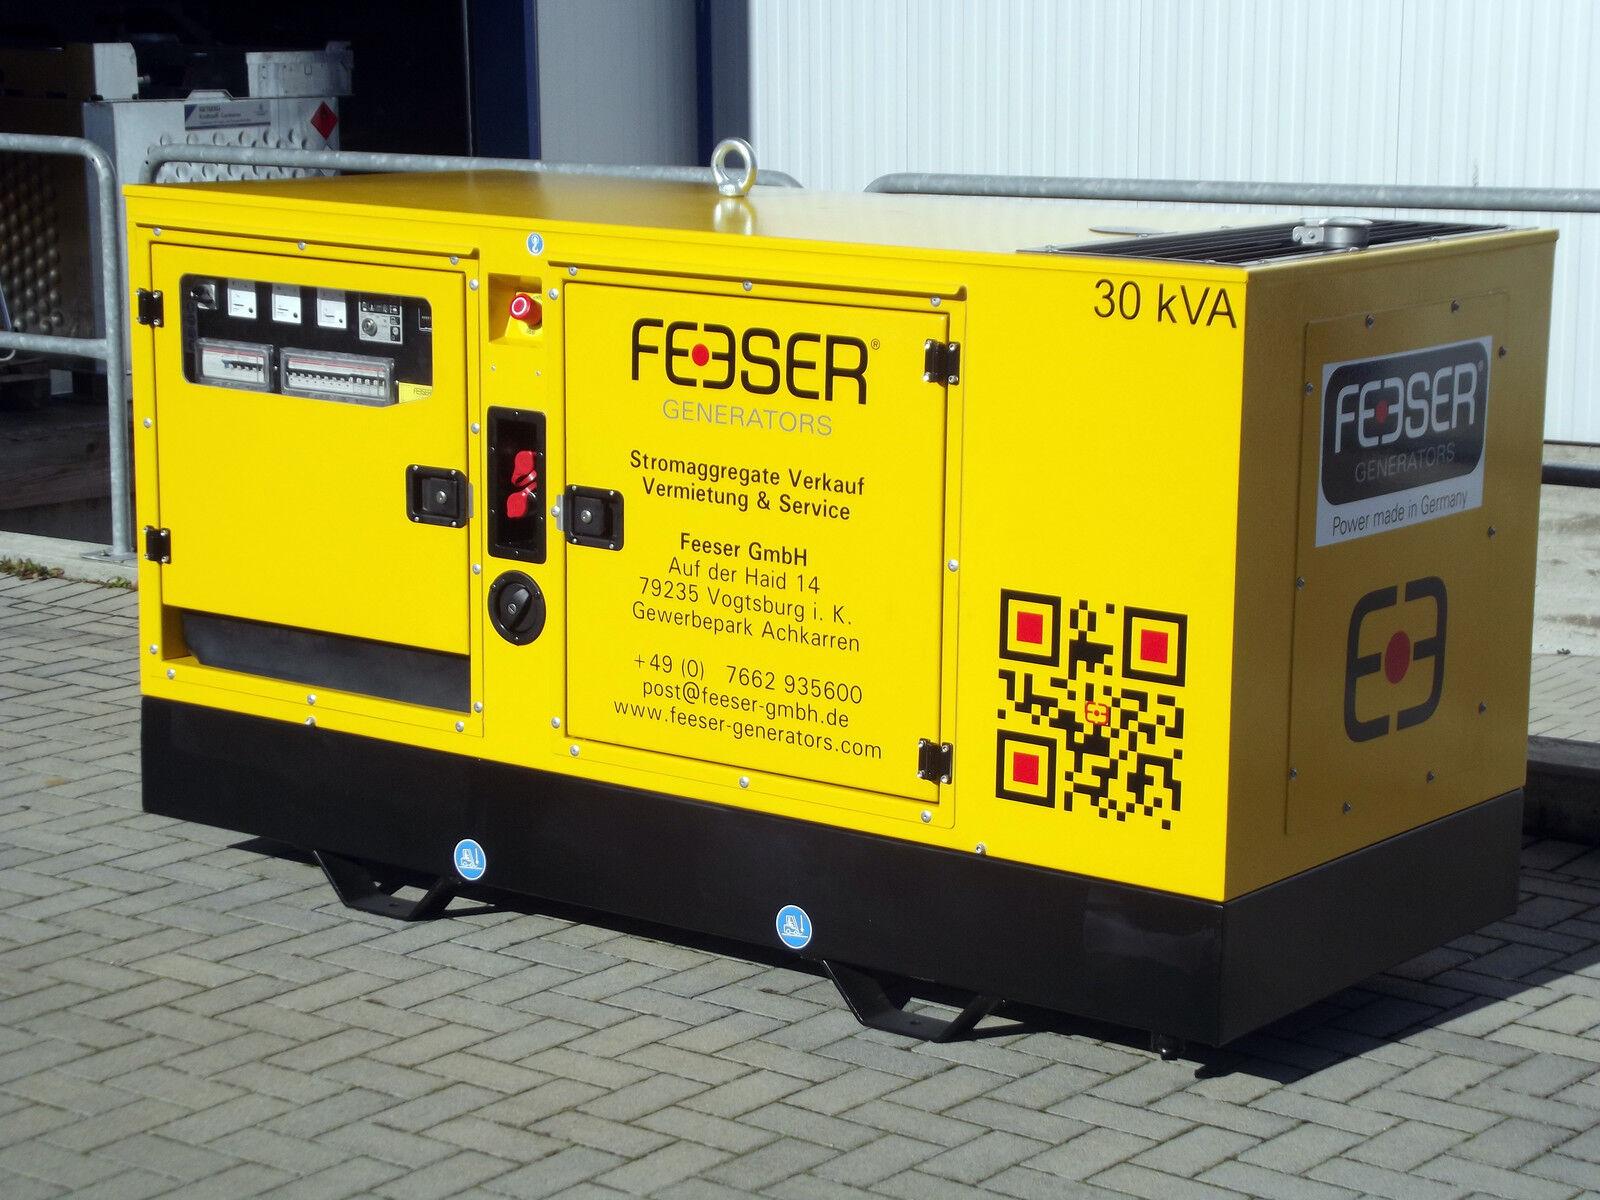 Feeser-Tools Germany